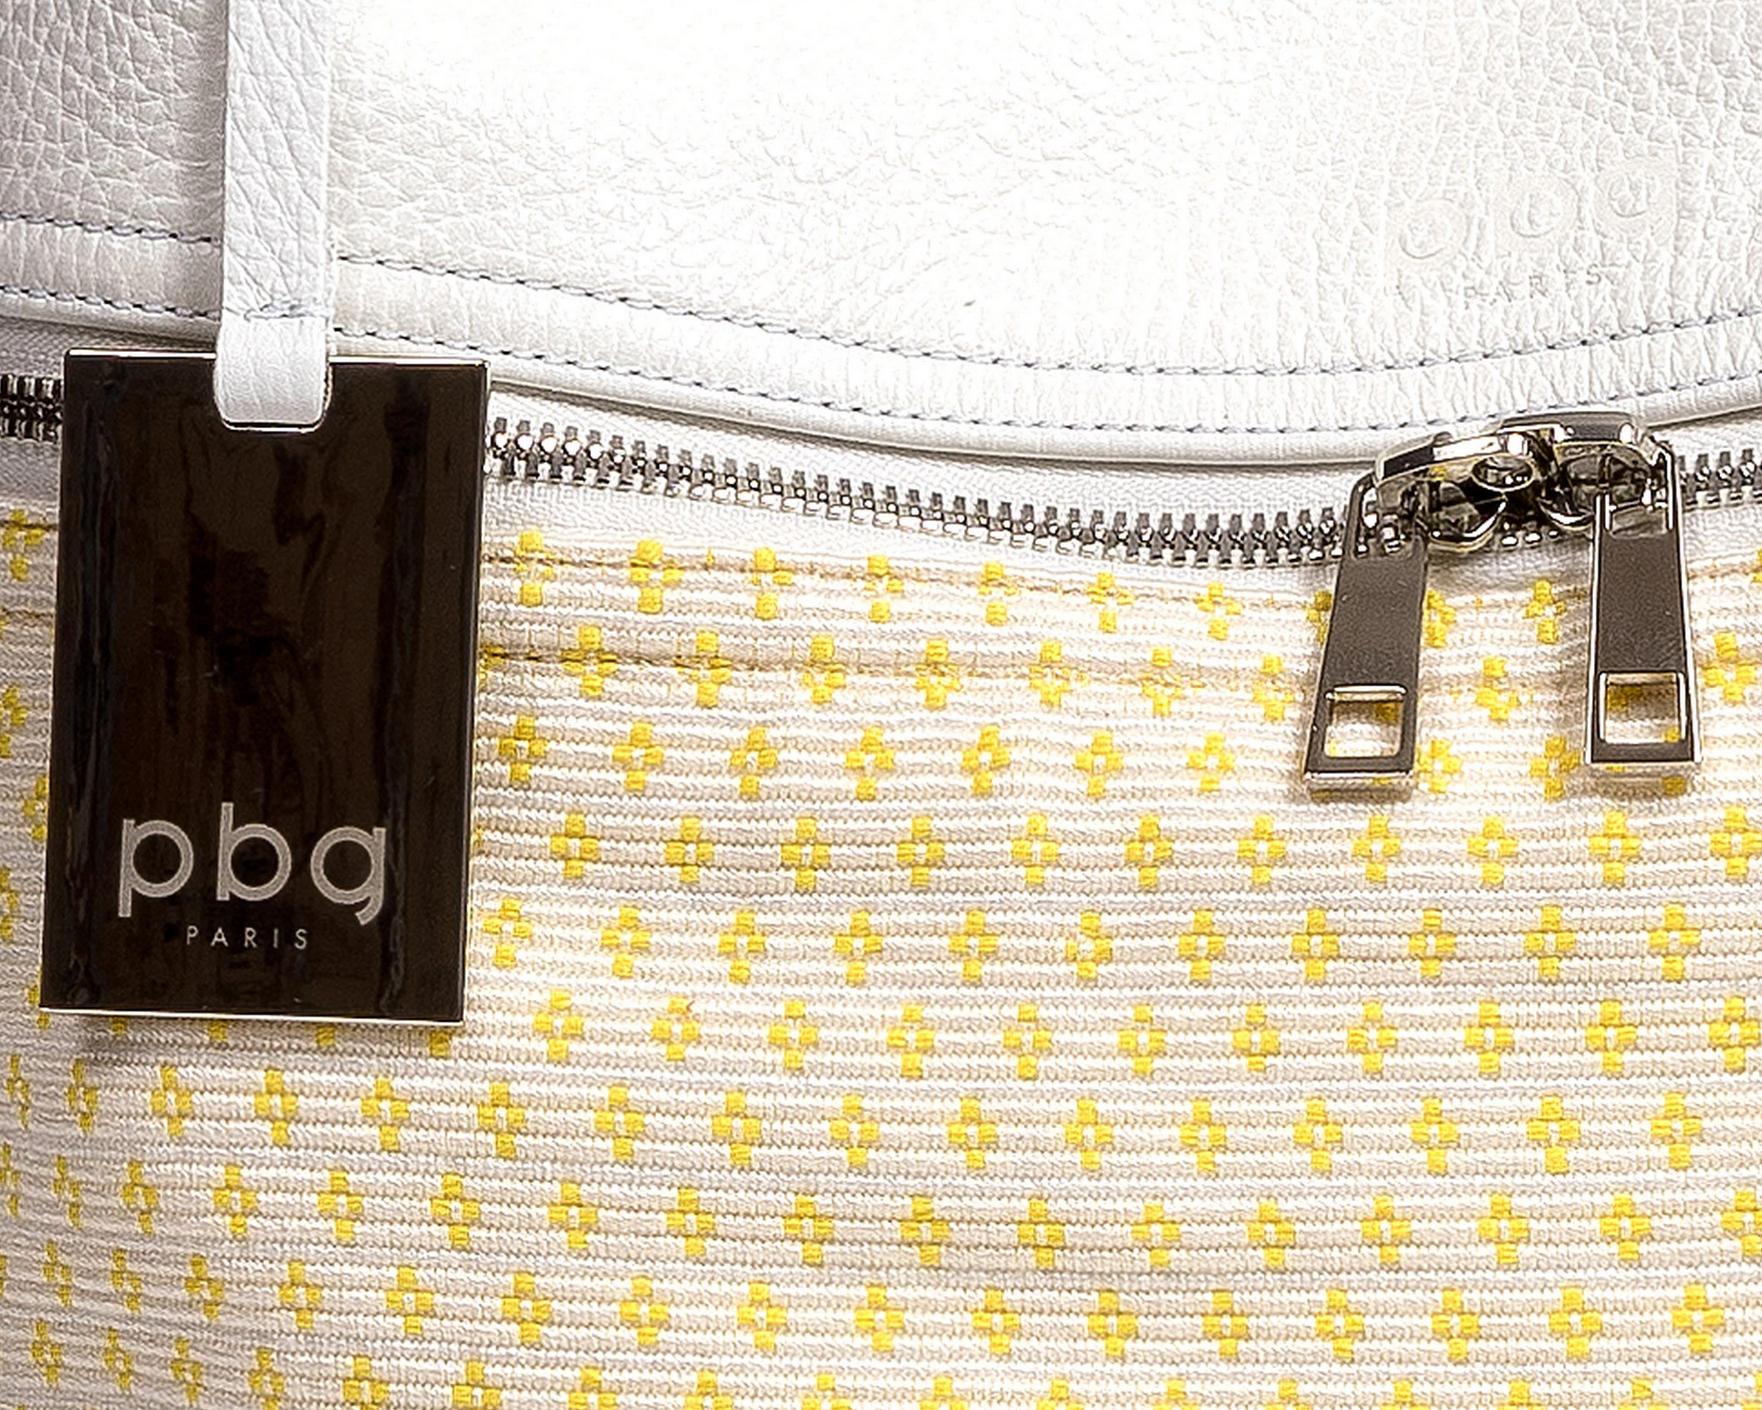 PBG PARIS-Bags of Hope Bucket bag large, white